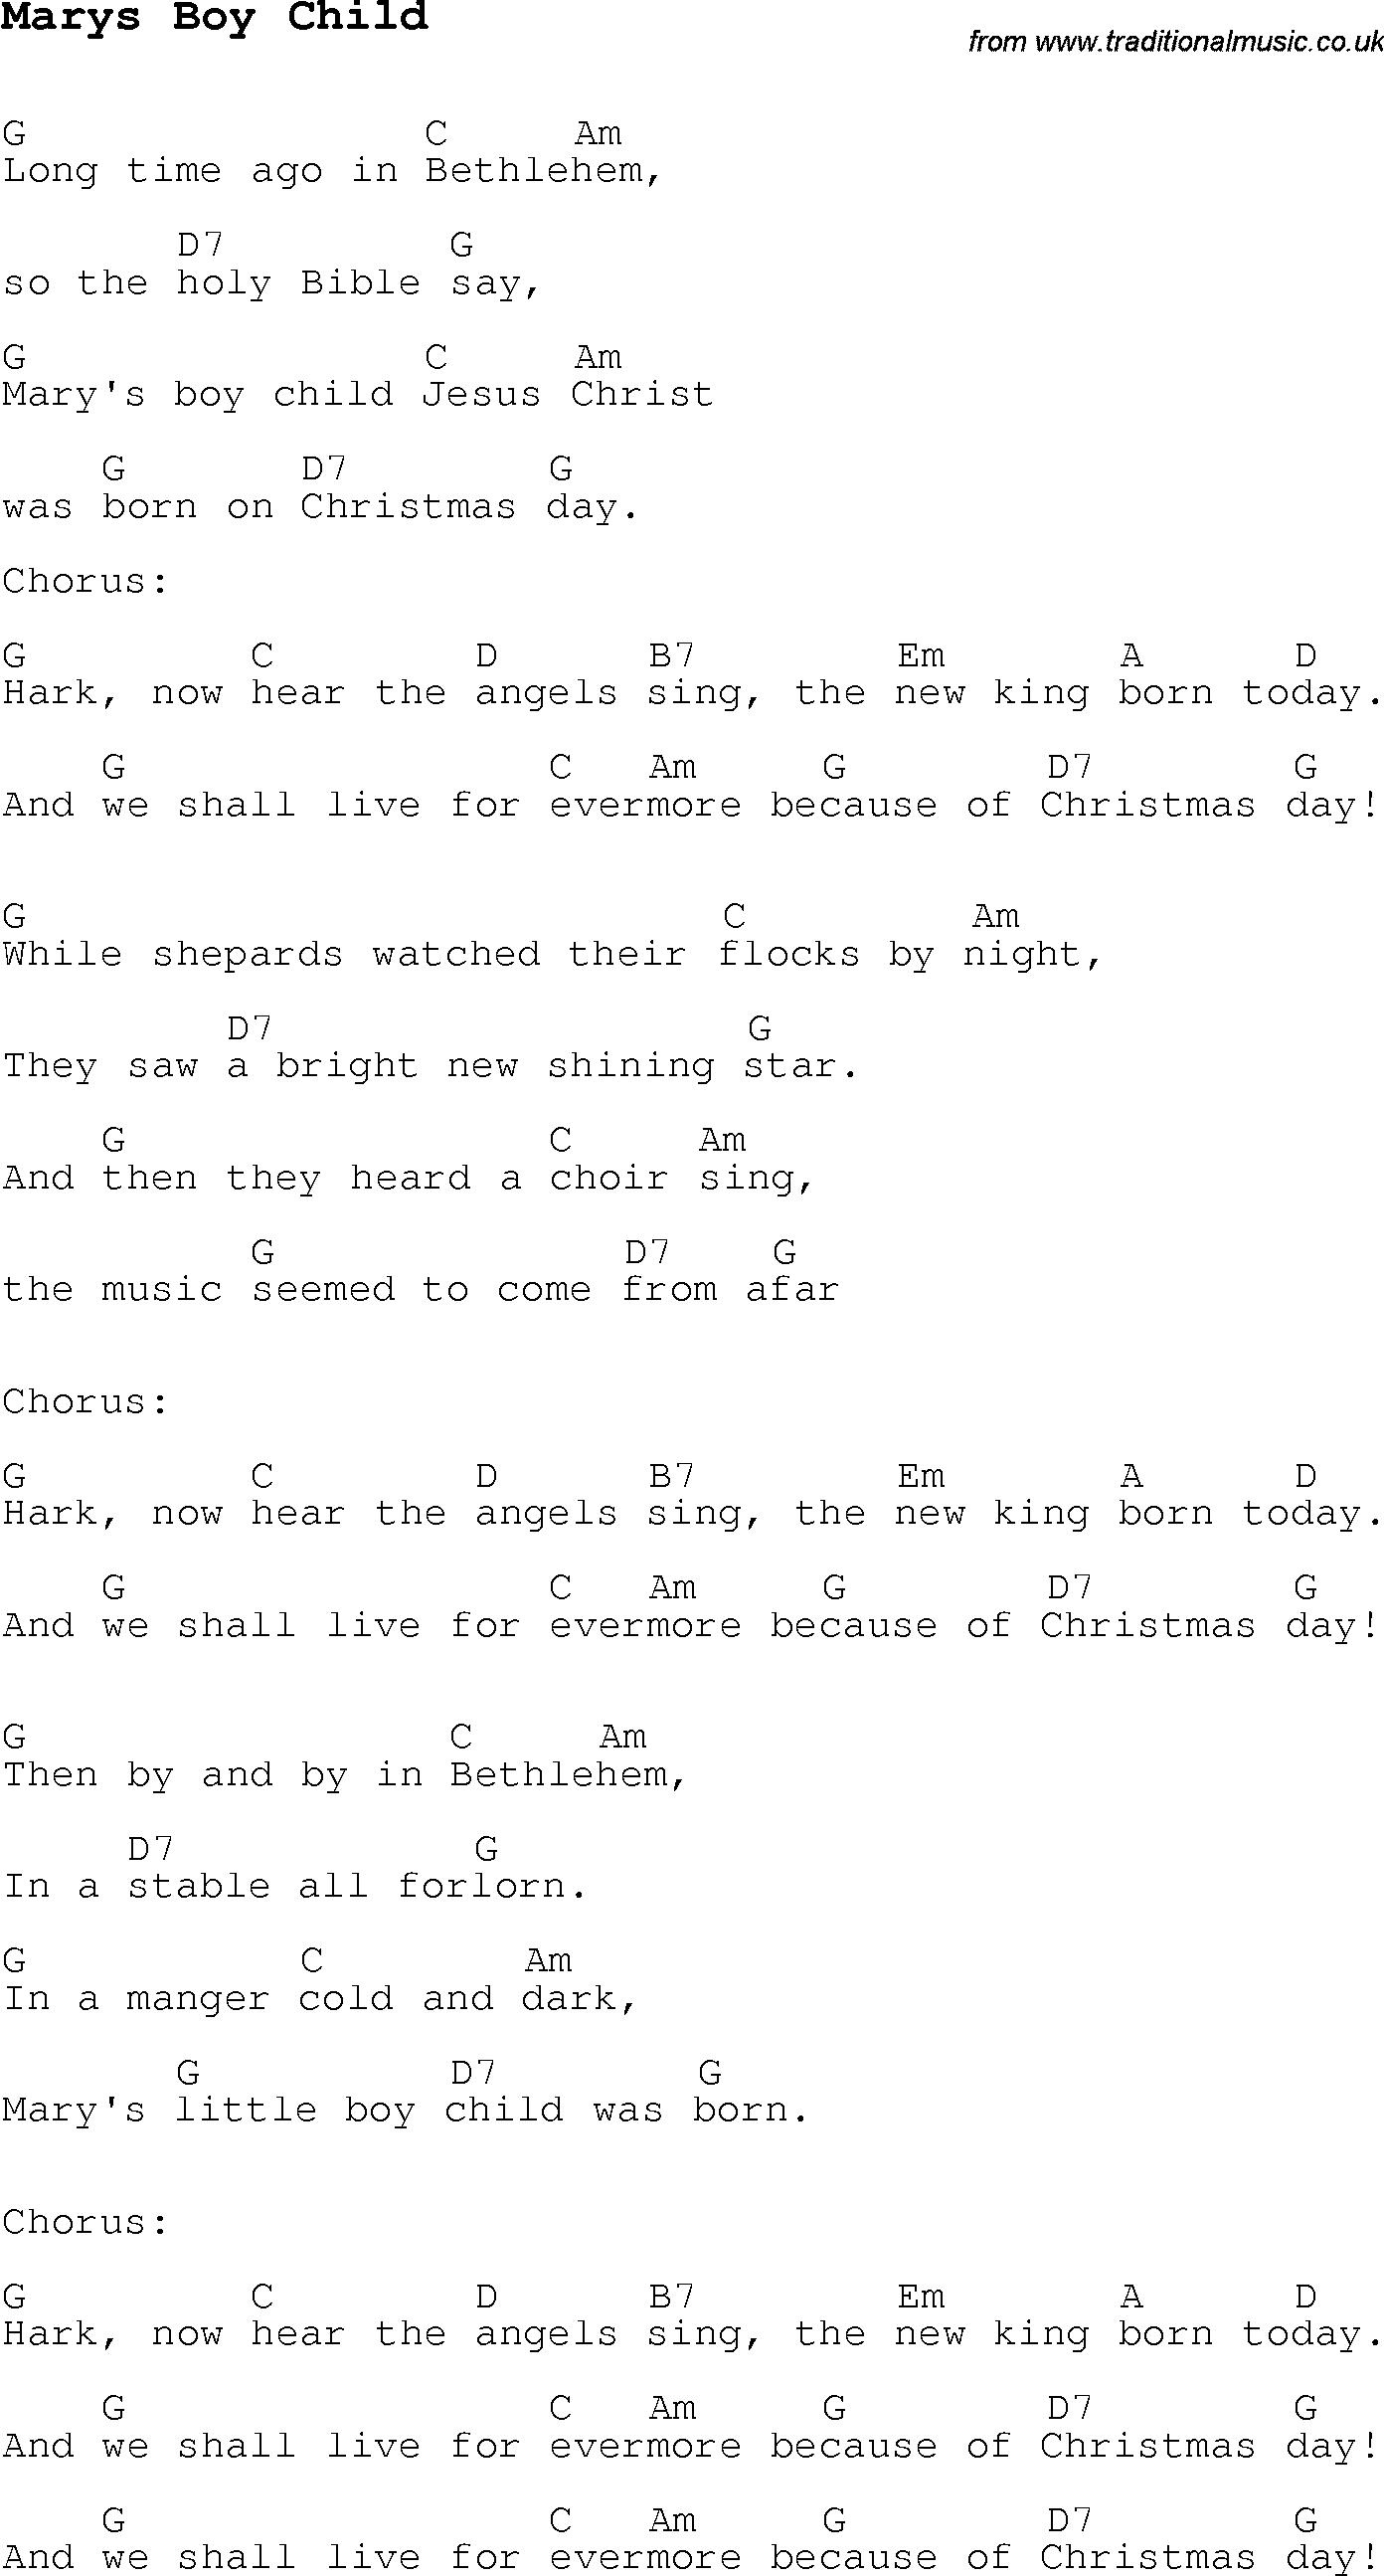 Christmas Songs And Carols Lyrics With Chords For Guitar Banjo Uke String Diagram Related Keywords Suggestions Marys Boy Child